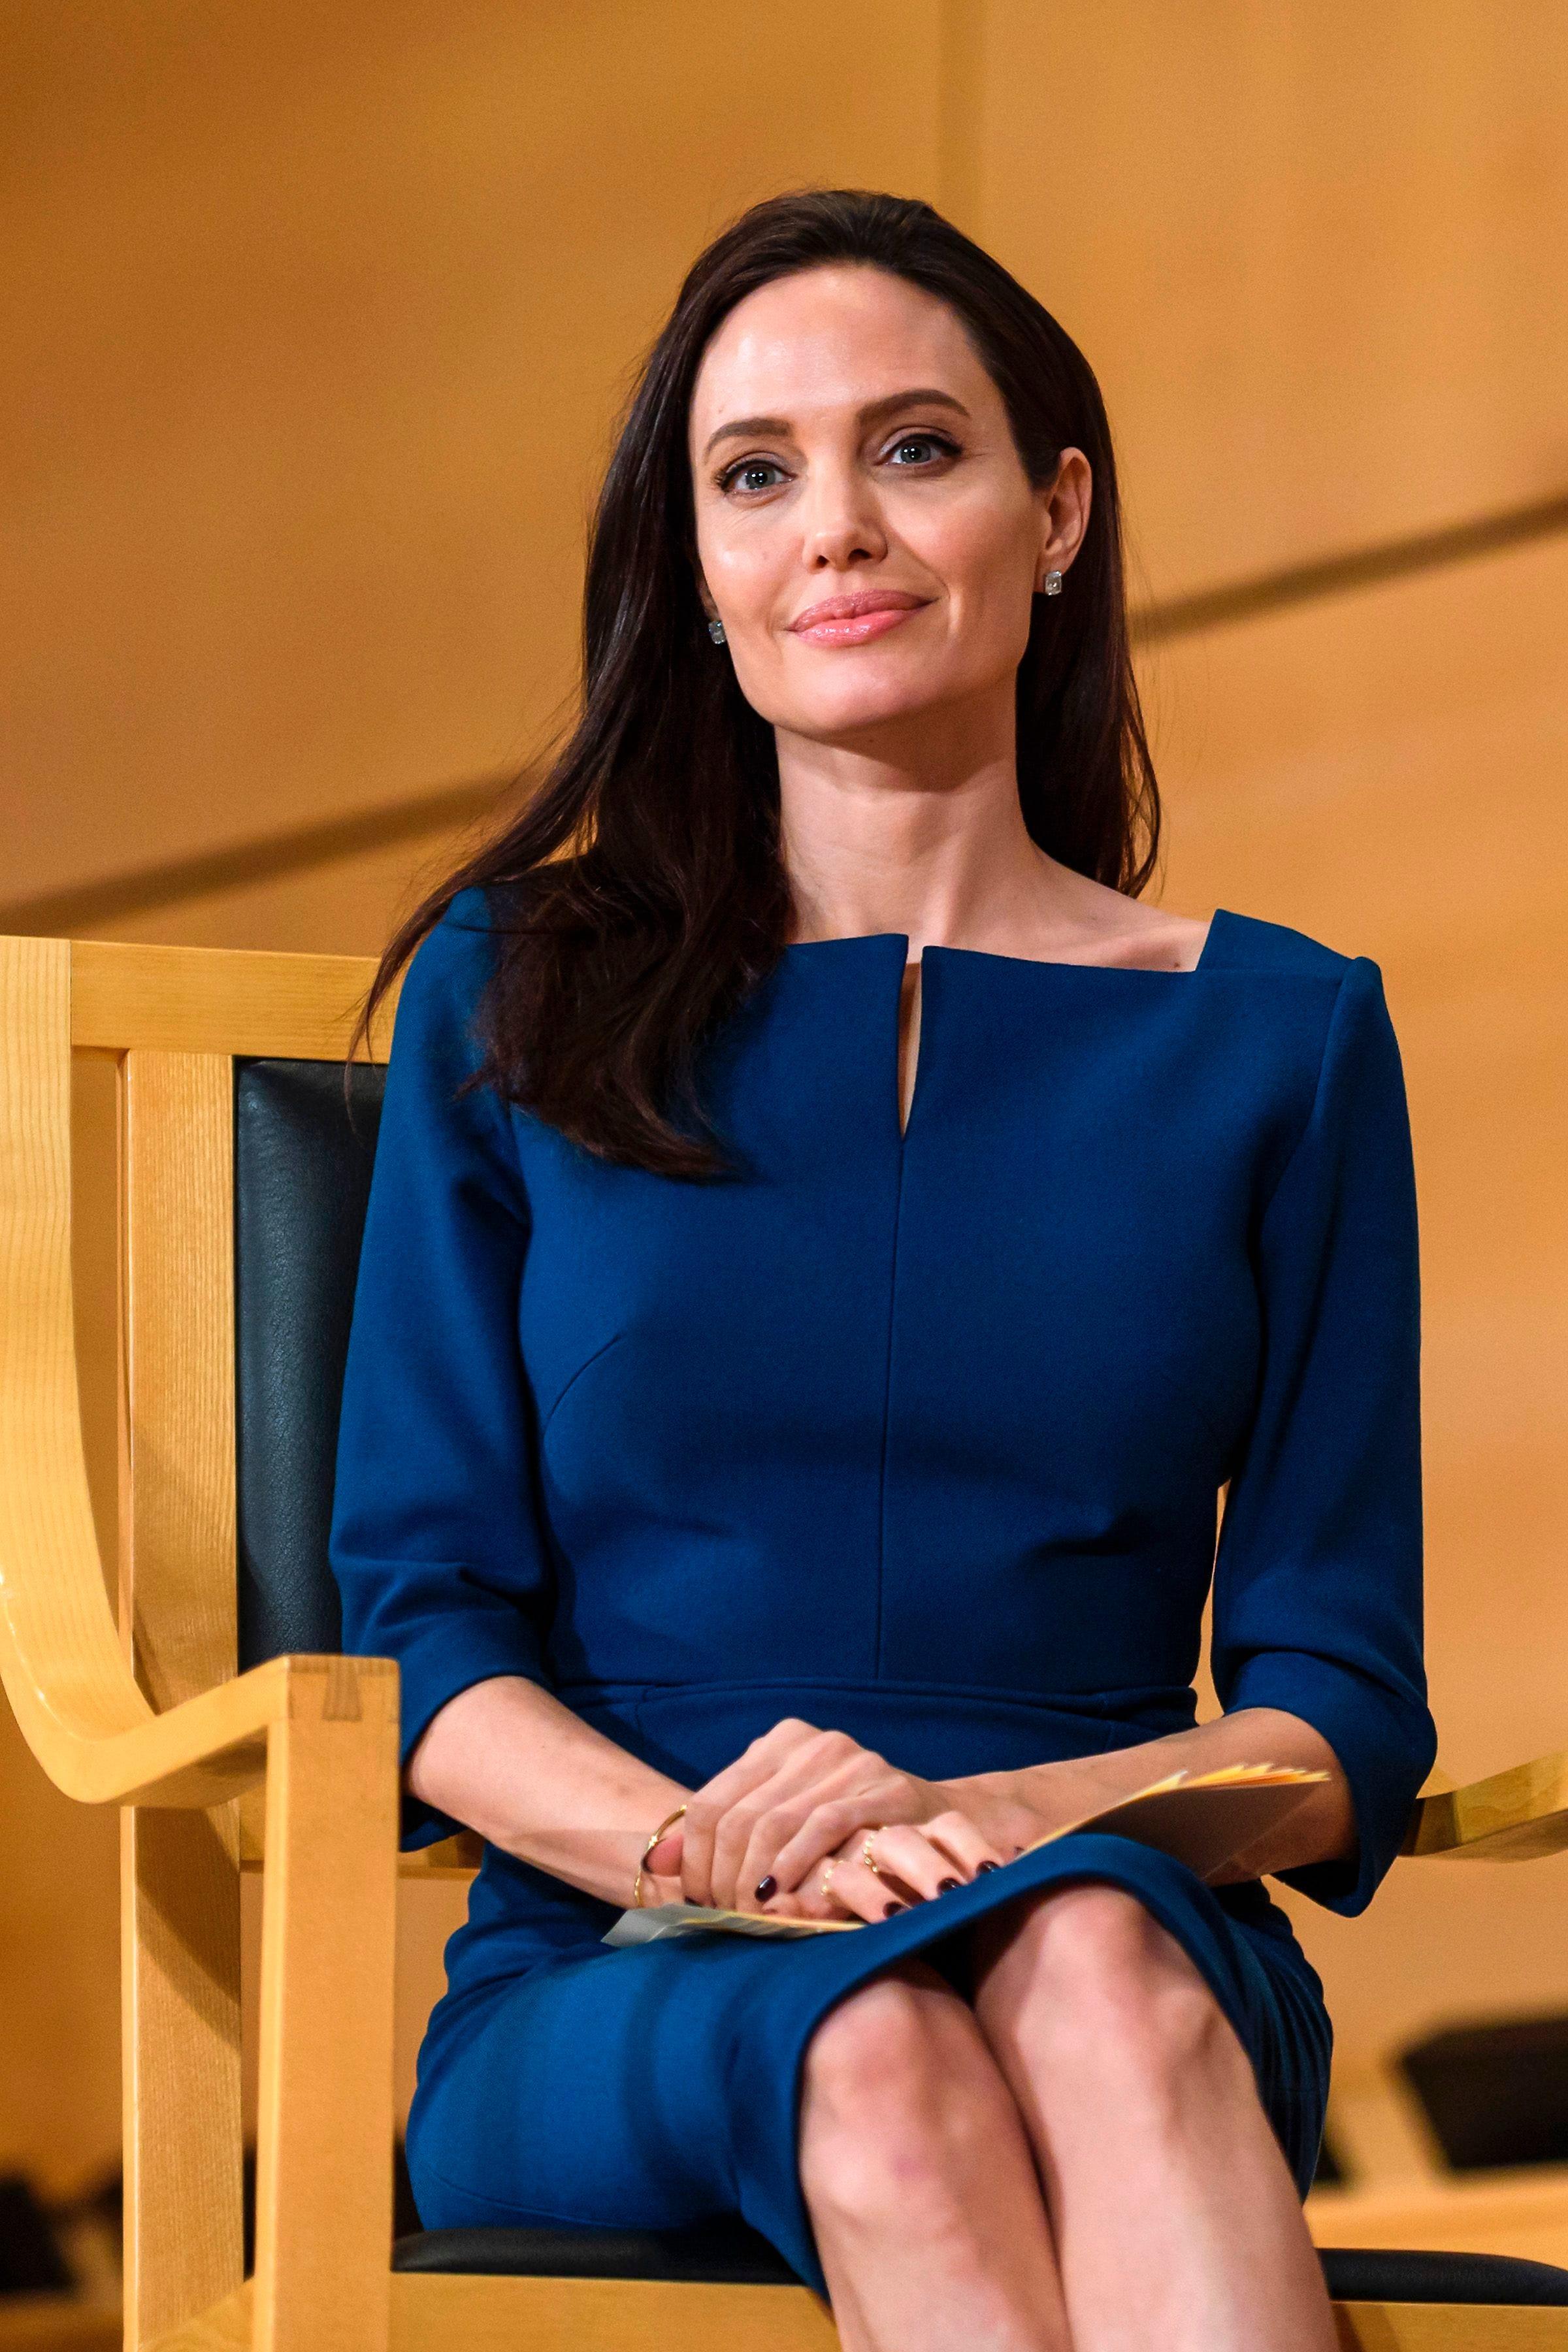 Angelina Jolie reveals Bell's Palsy diagnosis, breaks silence on divorce from Brad Pitt